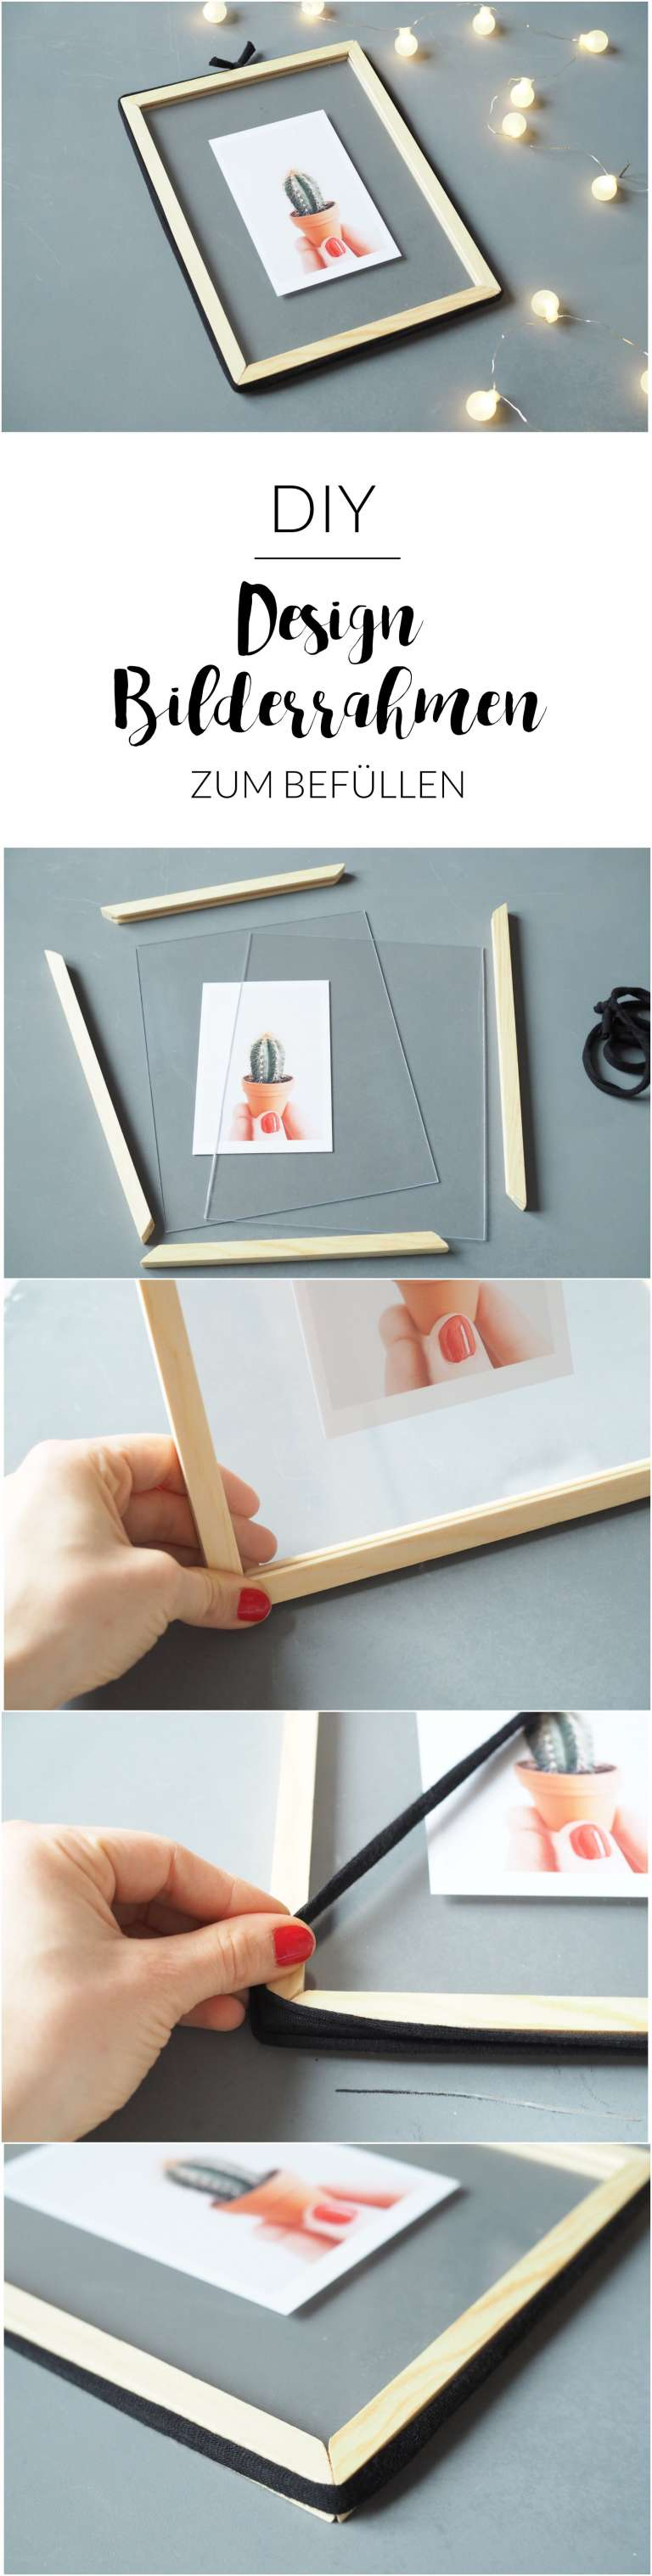 DIY-Design Bilderrahmen zum Befüllen | paulsvera